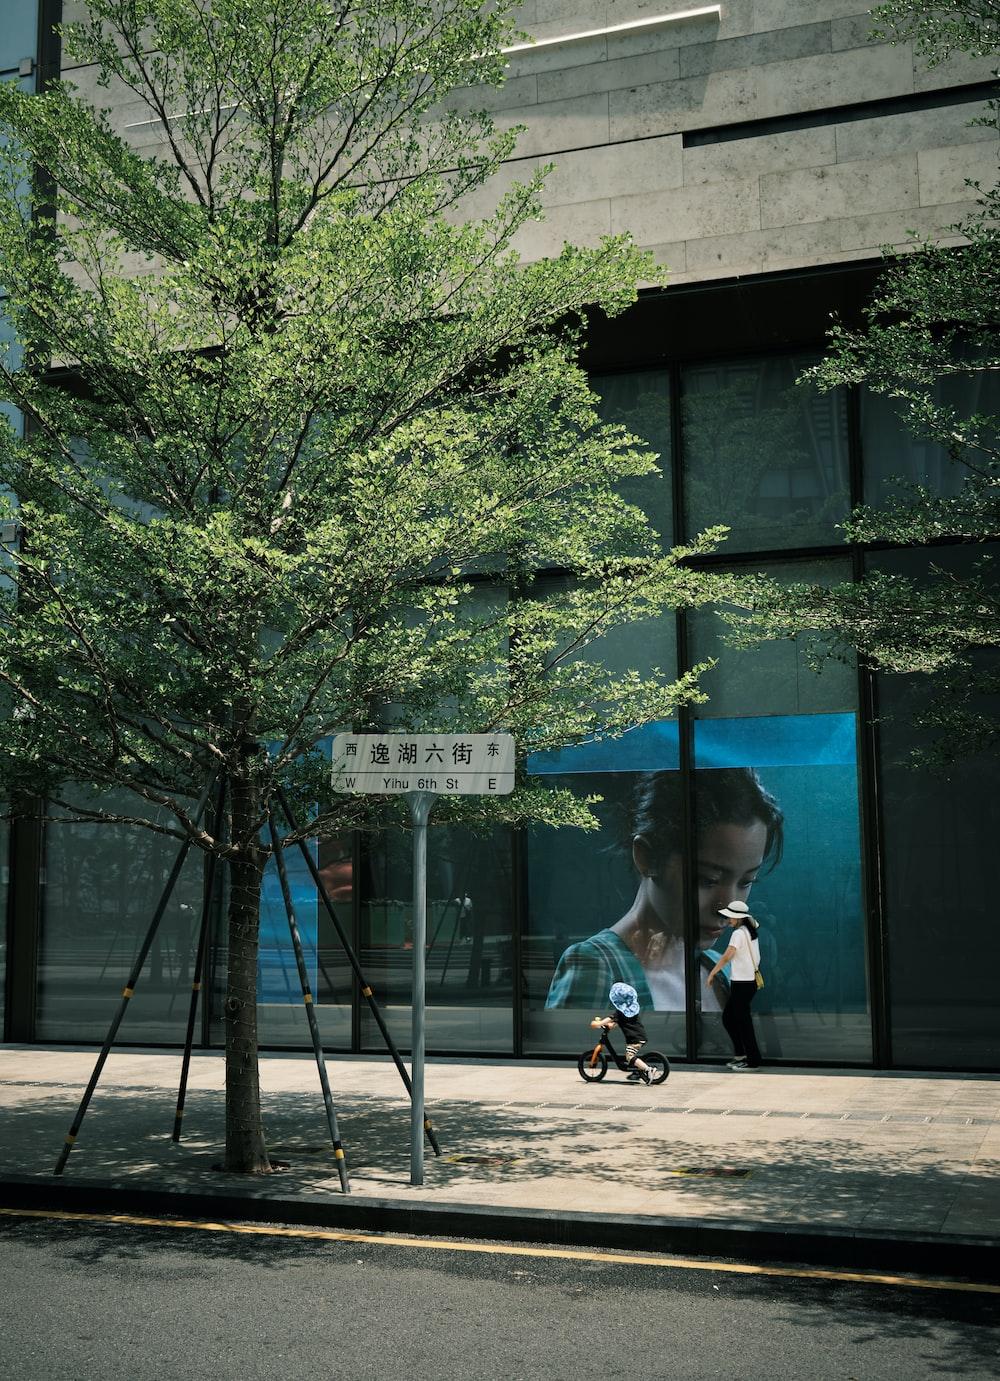 girl in black jacket riding bicycle near green tree during daytime